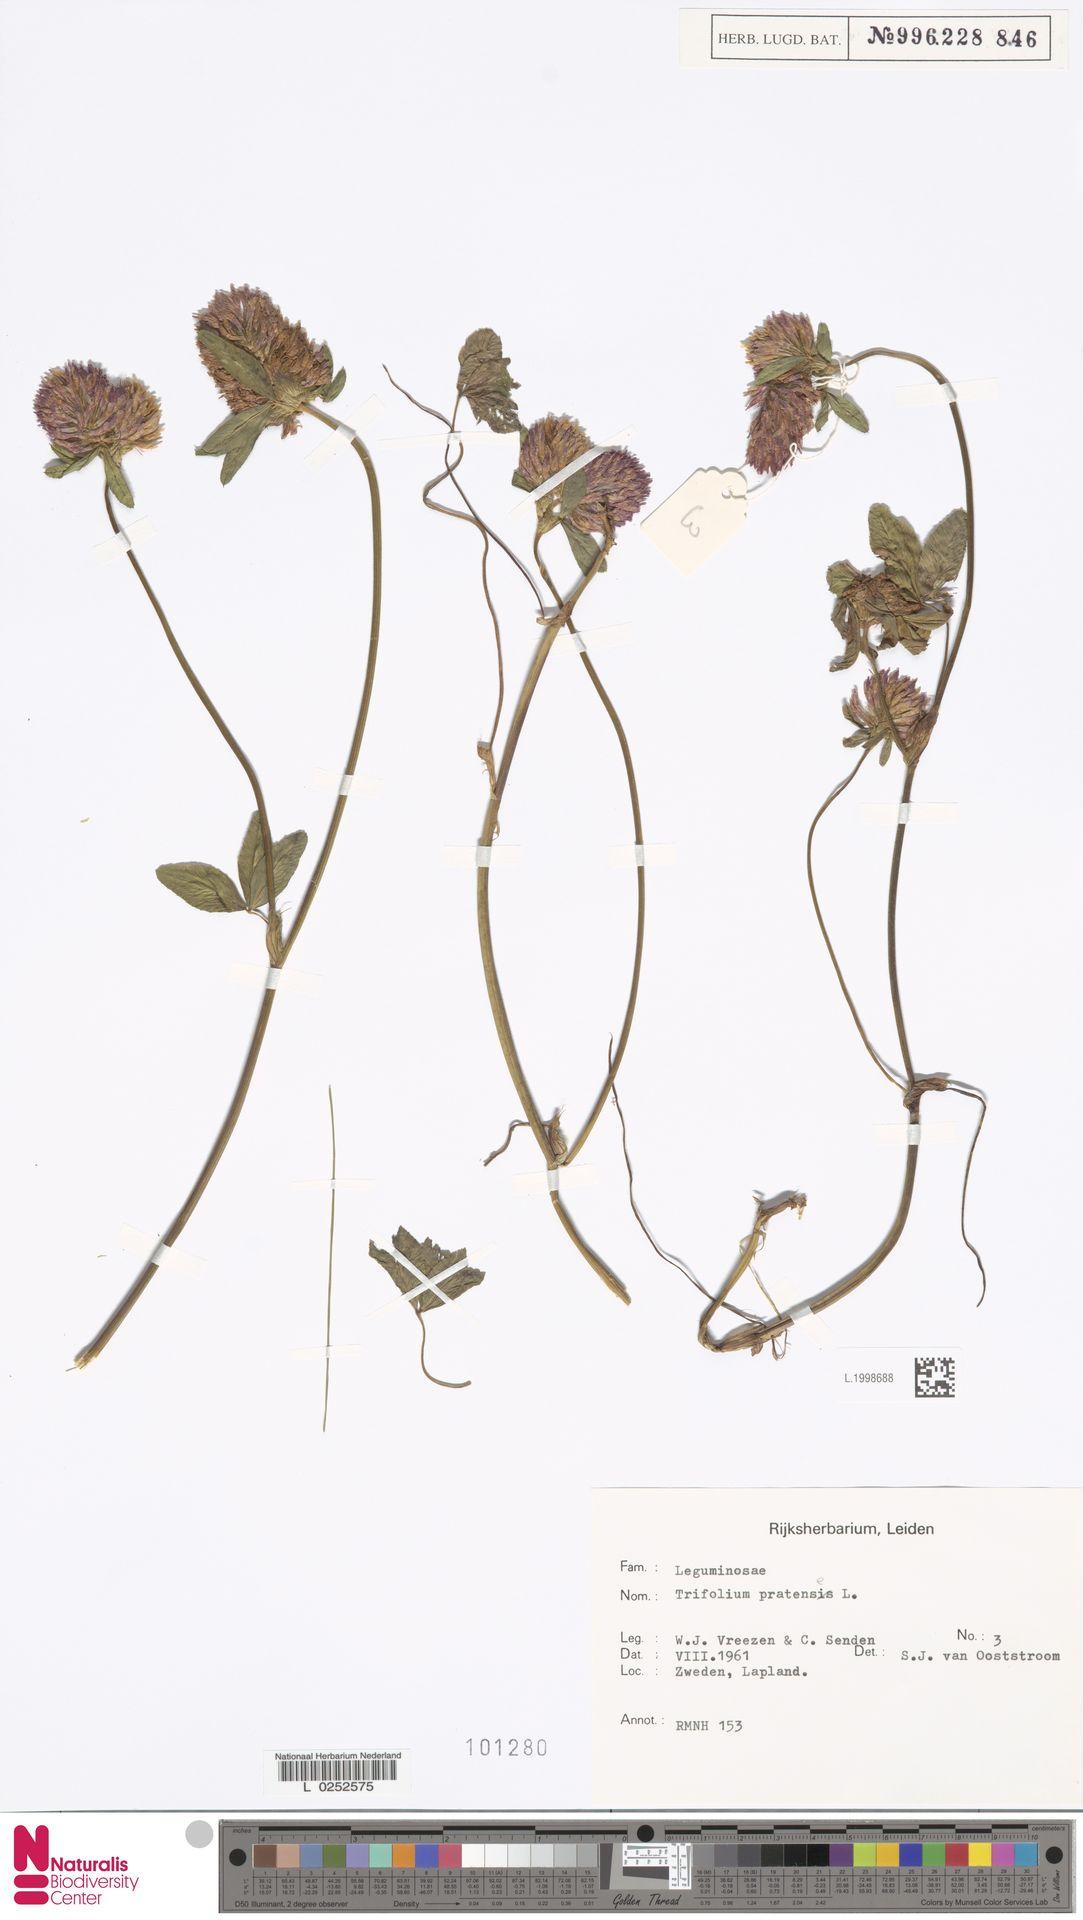 L.1998688   Trifolium pratense L.